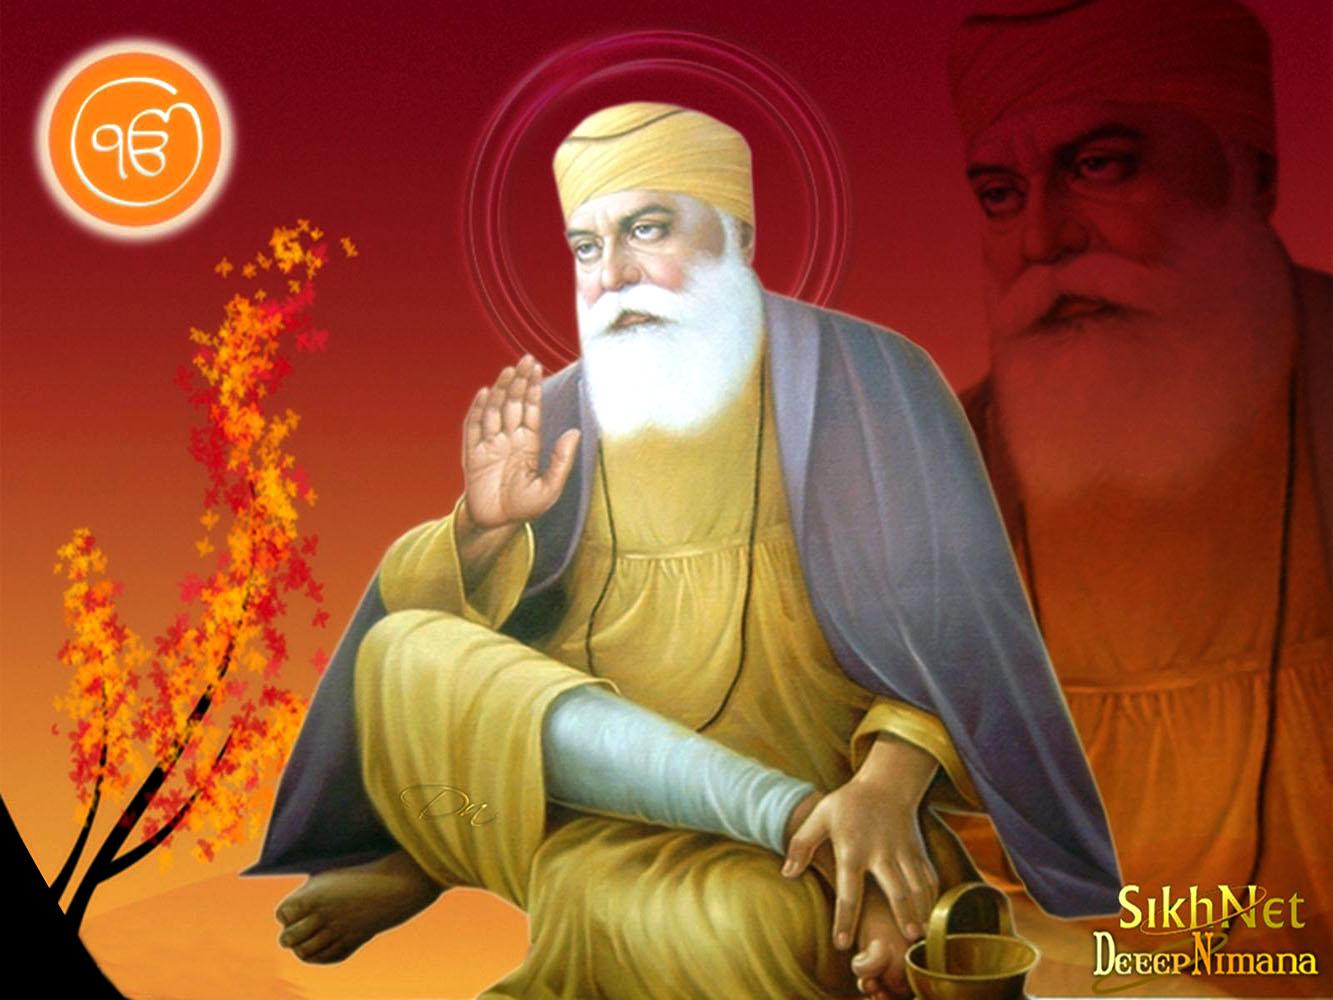 Free download guru nanak dev ji hd wallpaper #43.